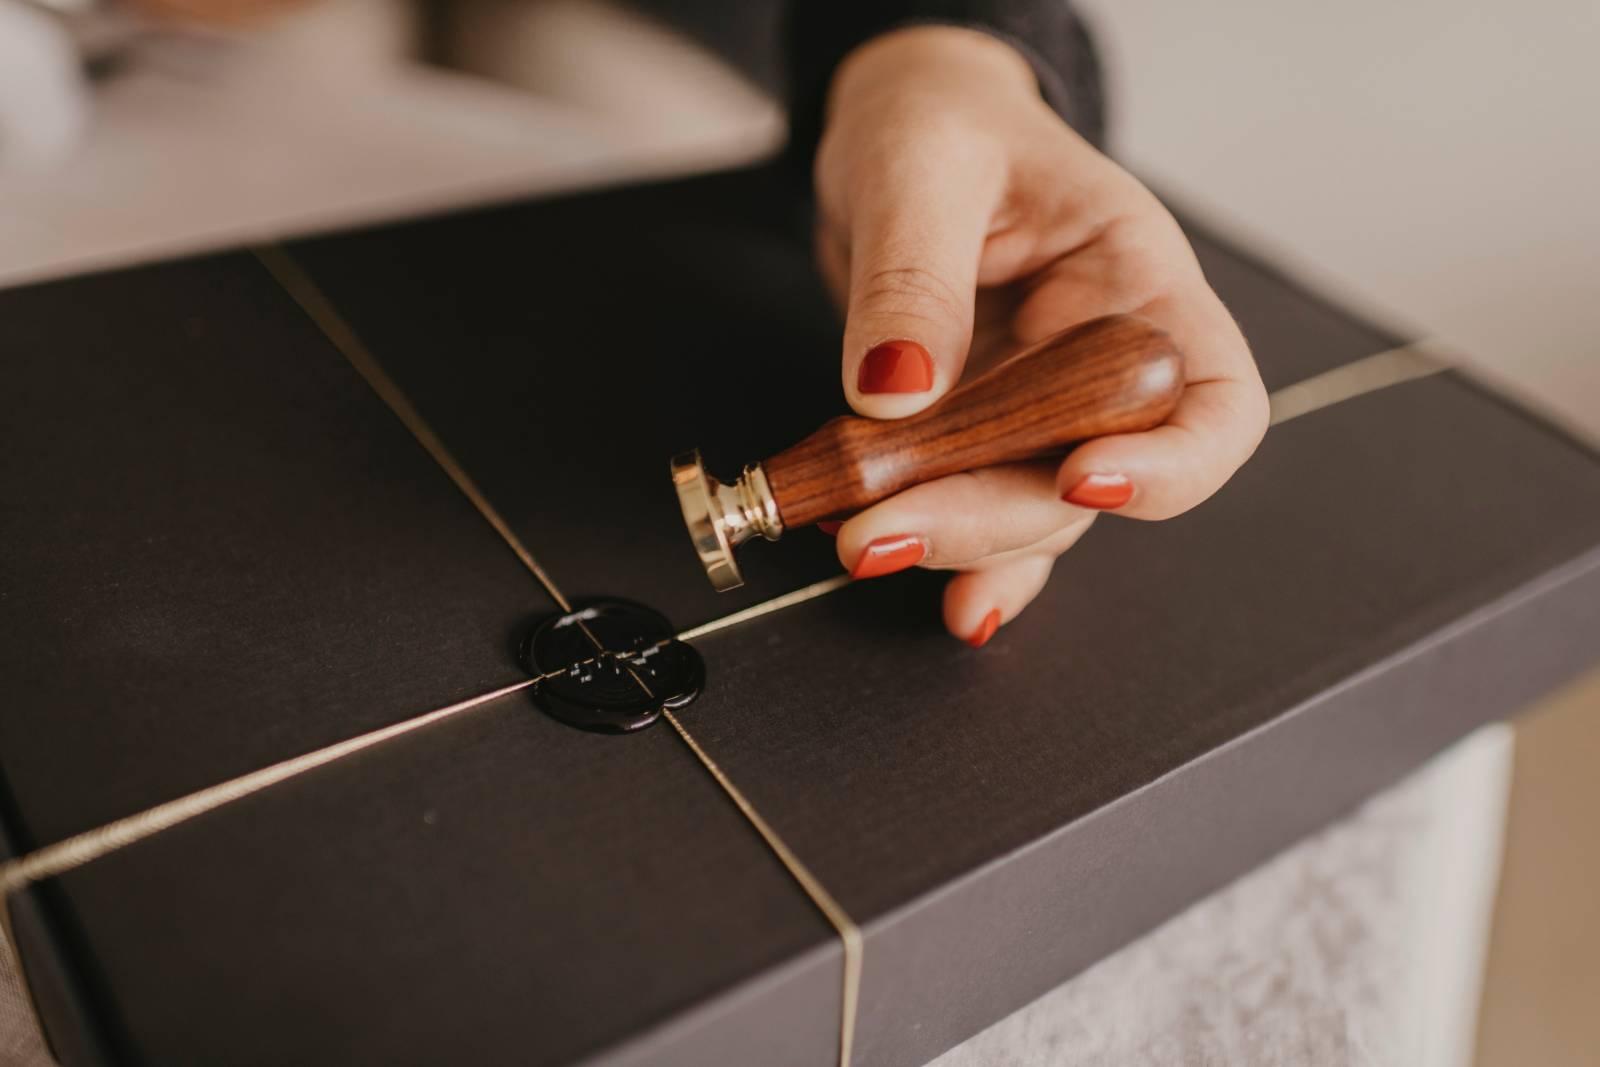 Touch of Gold - Trouwuitnodiging - Huwelijksuitnodiging - Kalligrafie - House of Weddings - 27